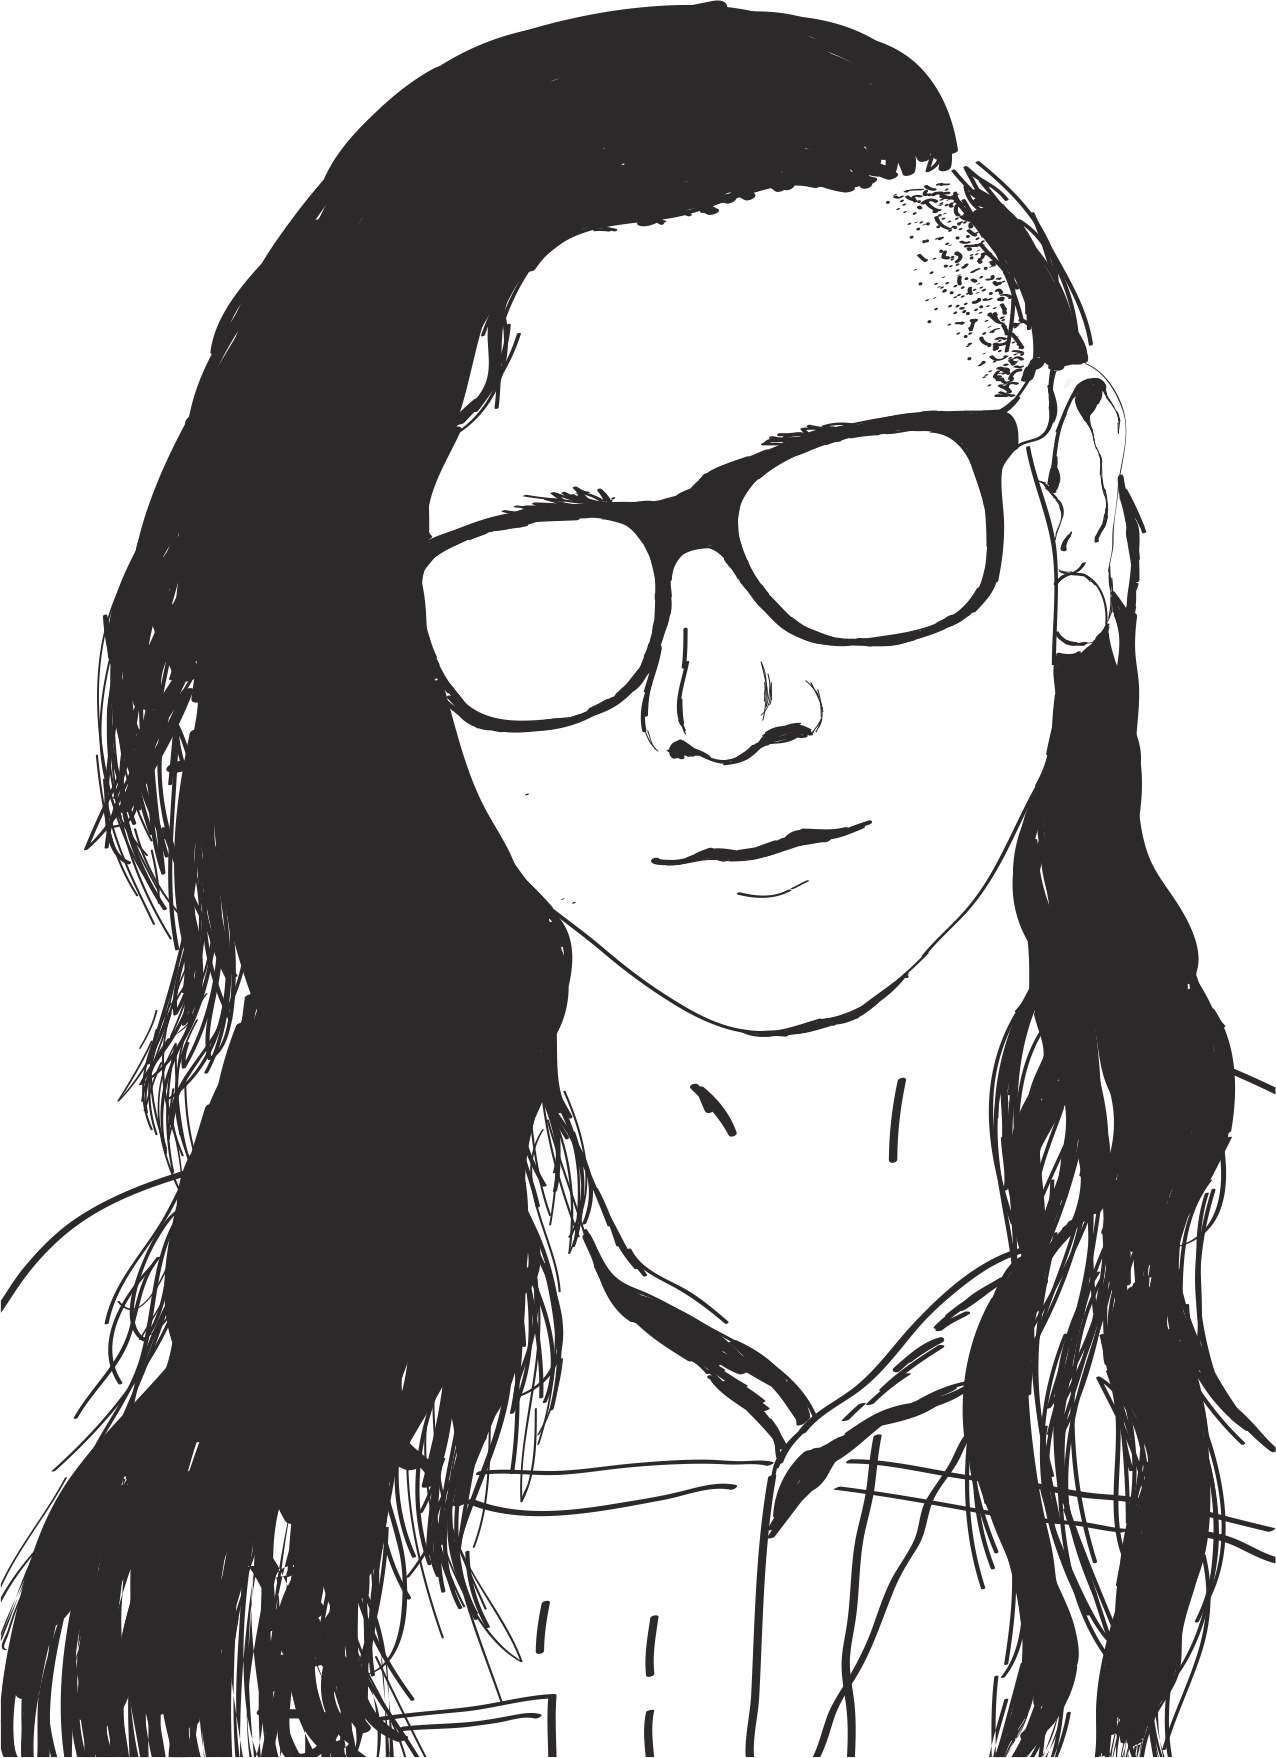 Girl Skrillex Sonny Moore By Michaelalebedikova Free CDR Vectors Art